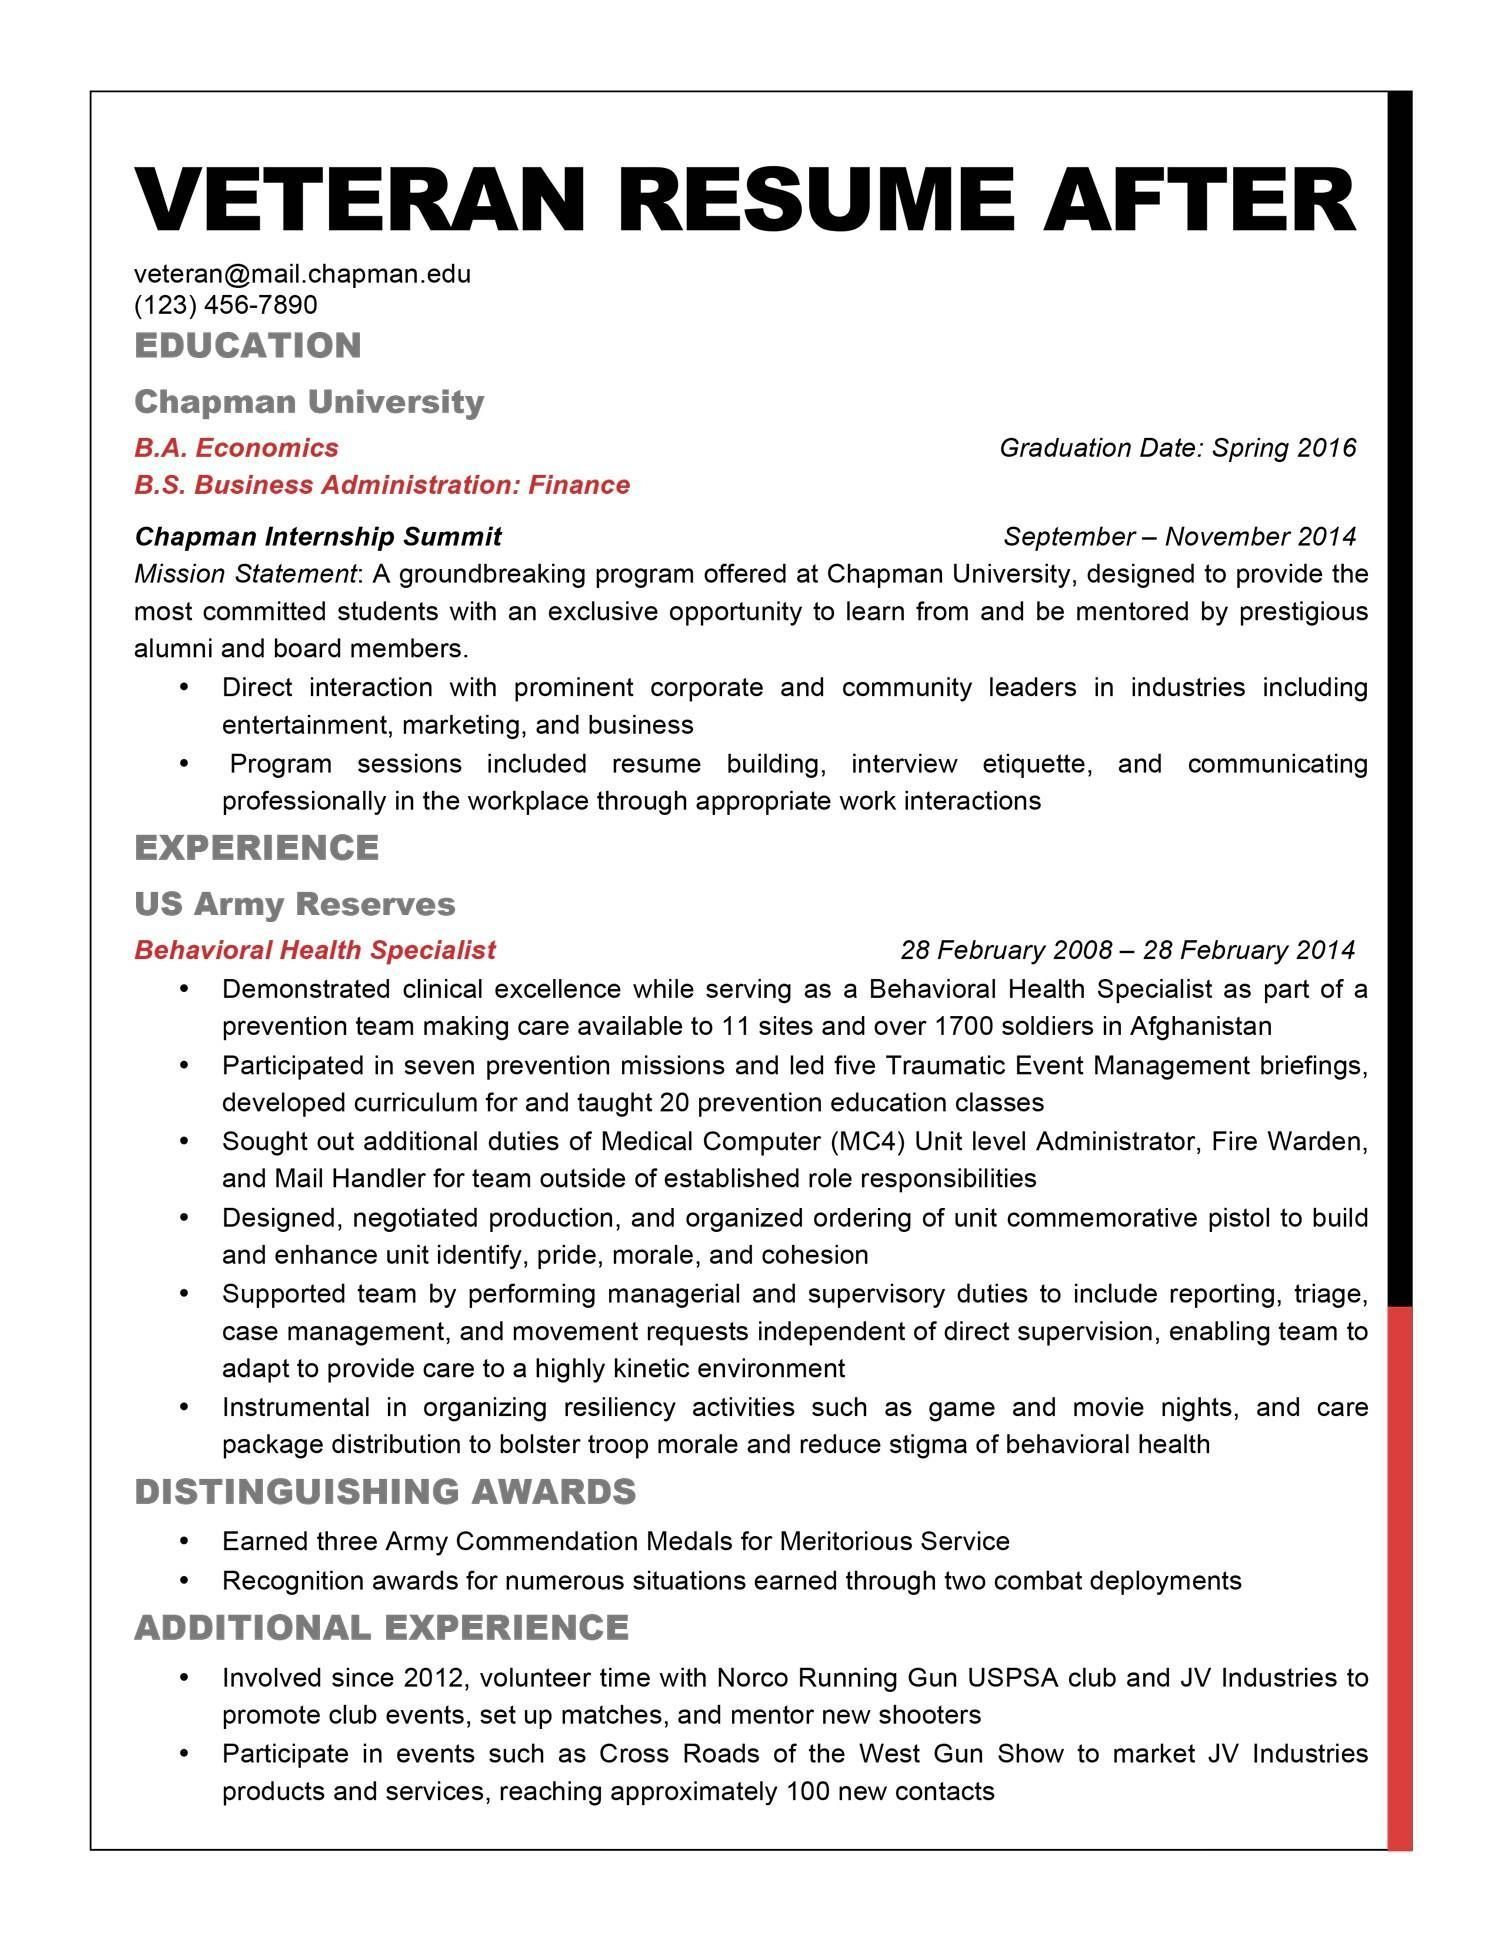 Veterans Job resume examples, Resume builder, Resume